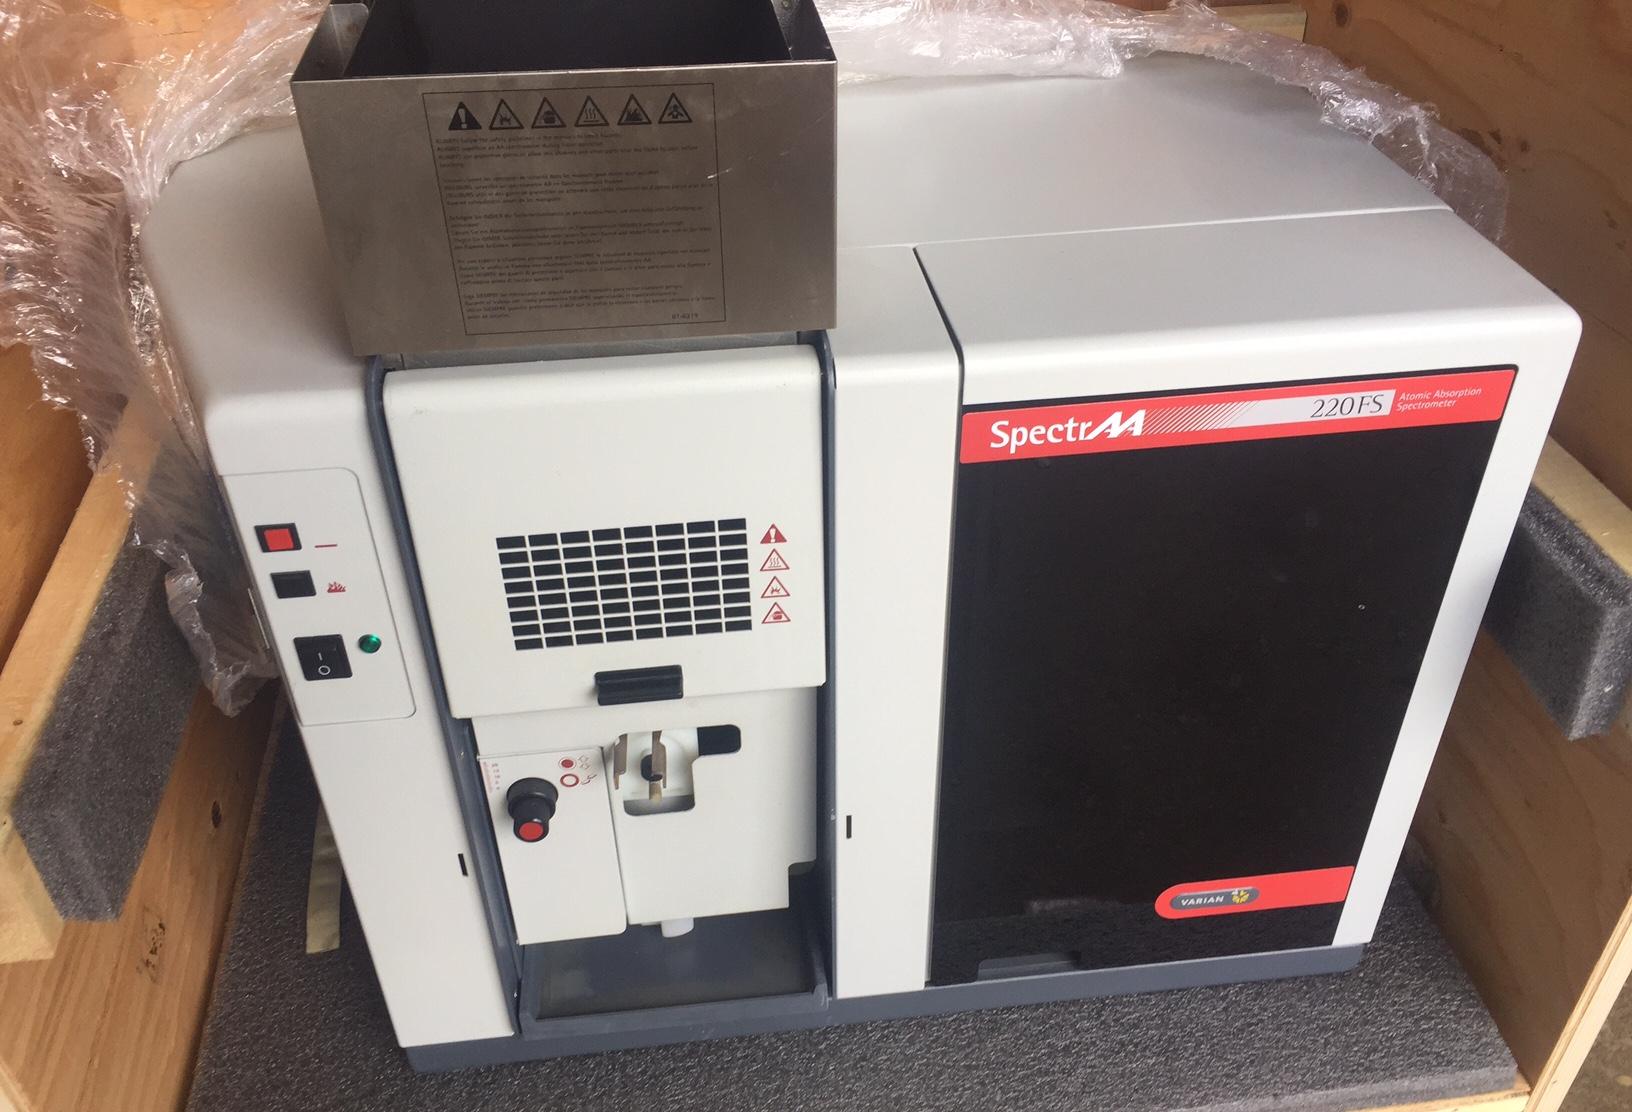 Varian SpectrAA 220FS Spectrometer Varian 220FS FLAME AA